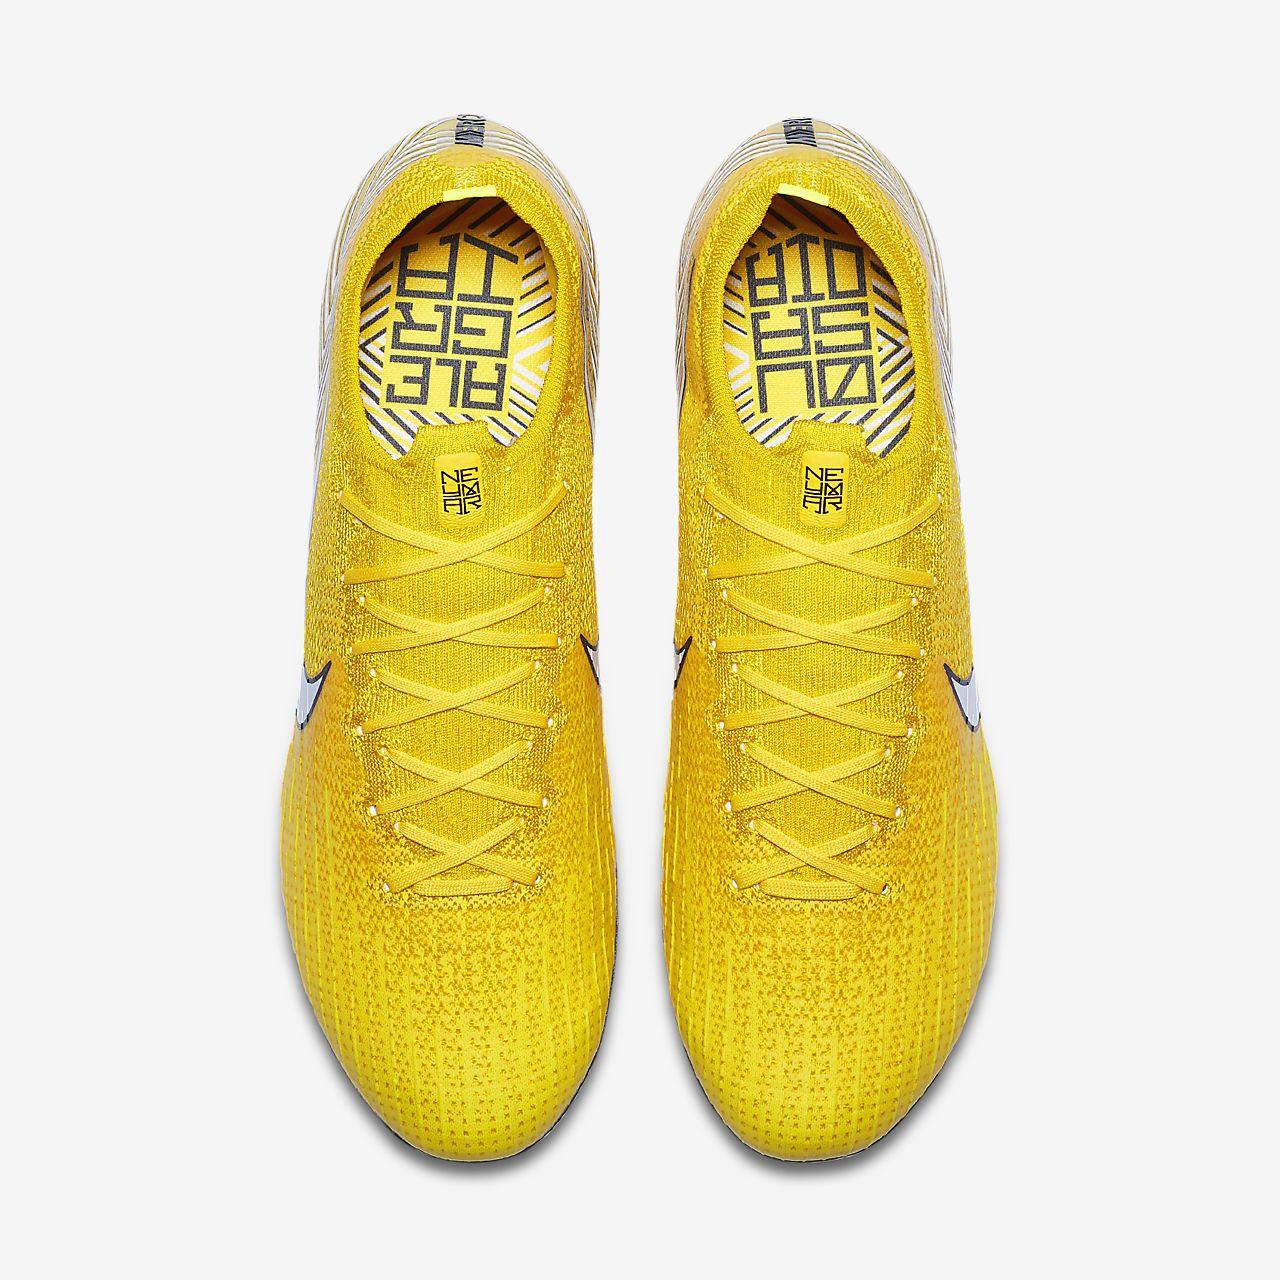 Nike Mercurial Vapor 360 Elite Neymar Jr AG-PRO Fußballschuh für Kunstrasen